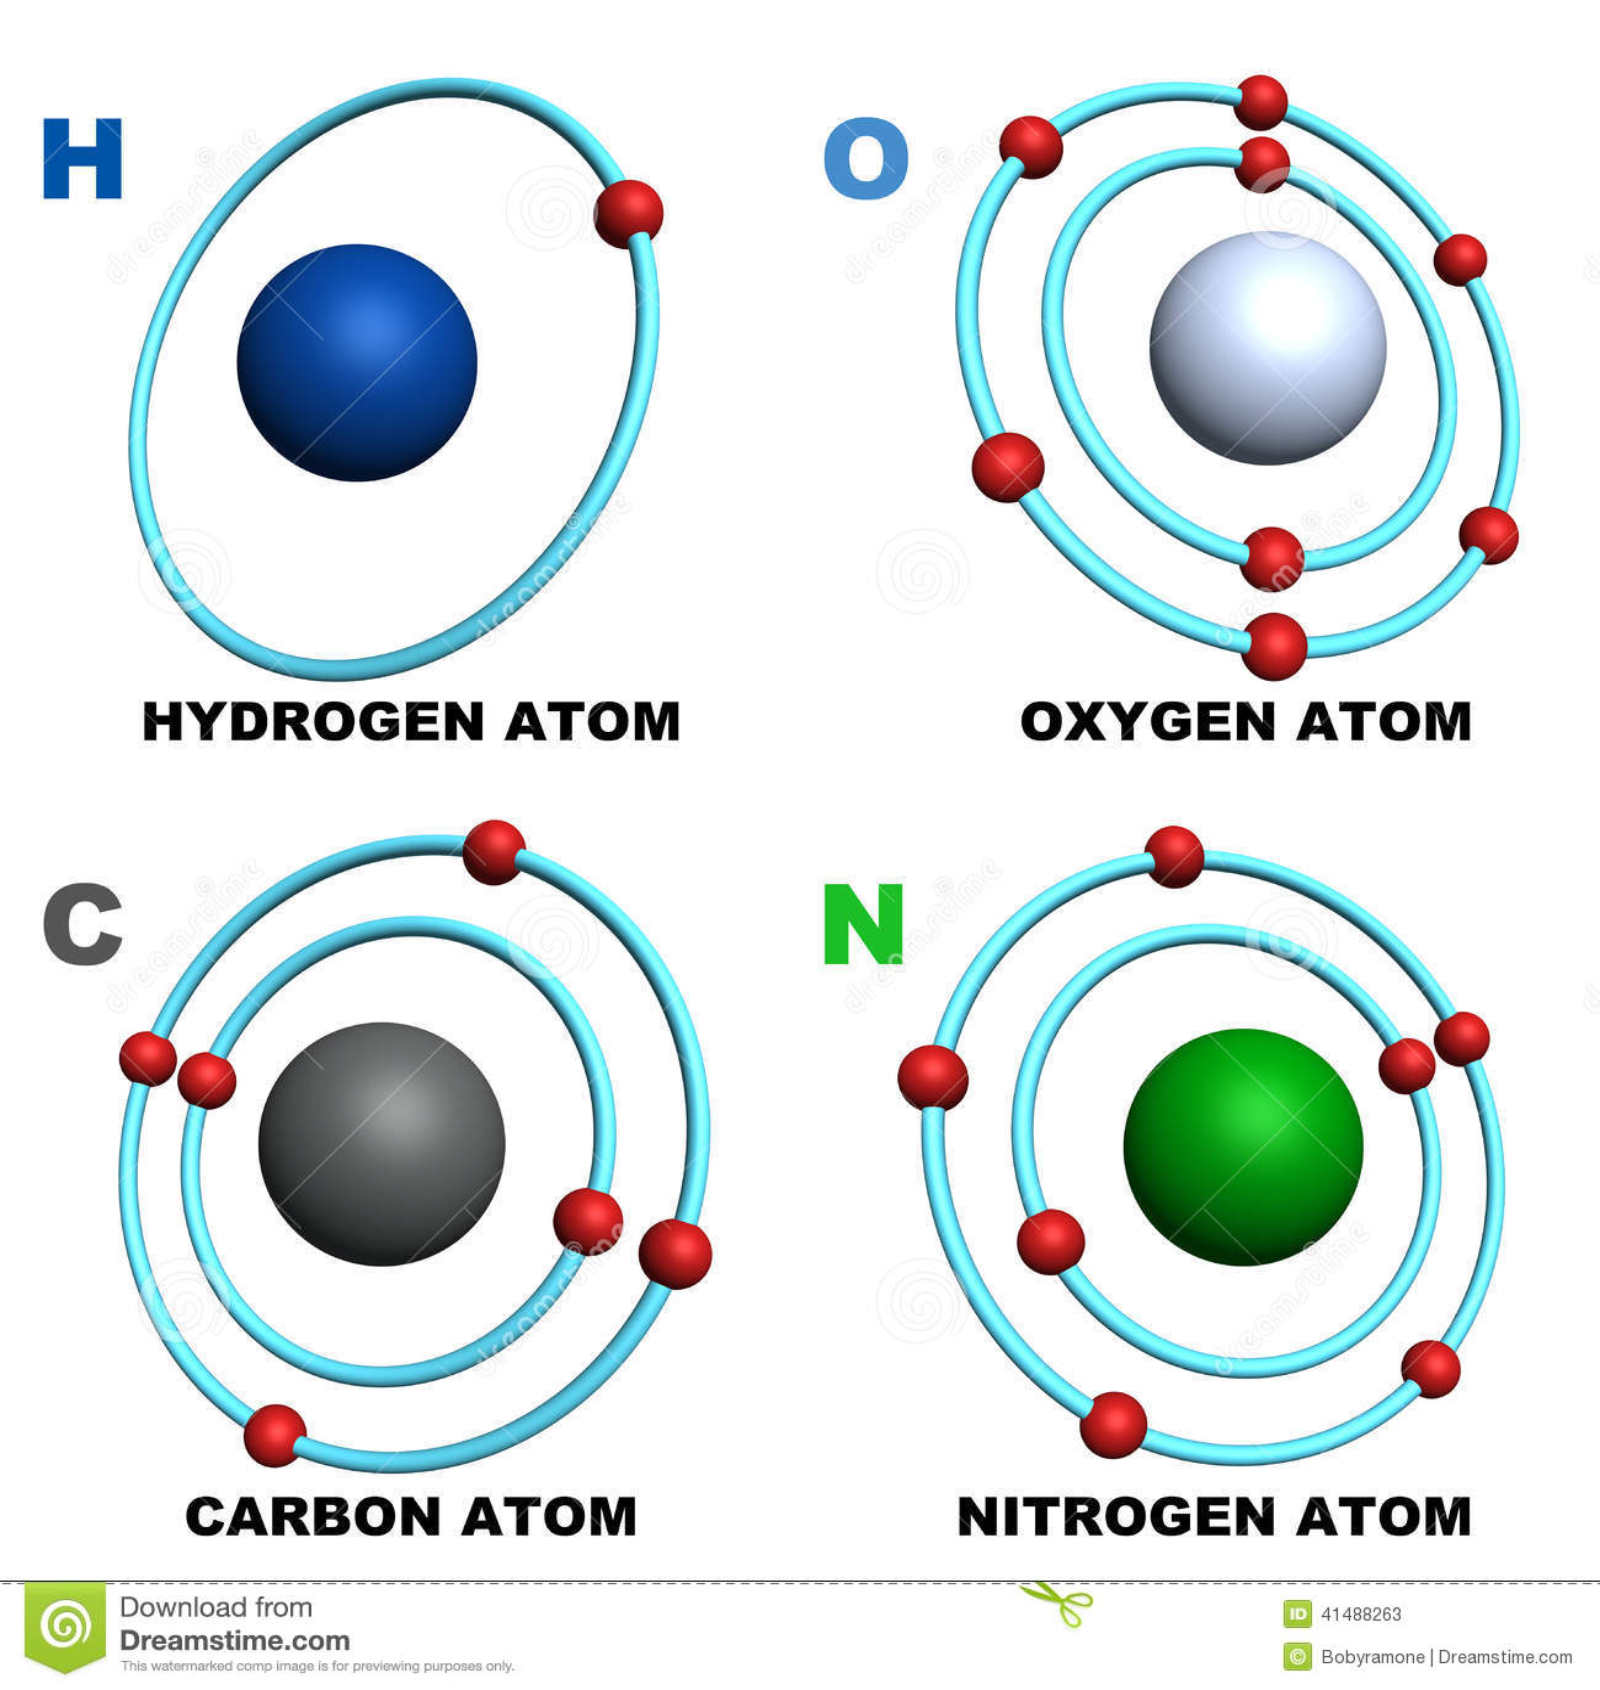 Hydrogen Oxygen Carbon Nitrogen Atom Stock Illustration